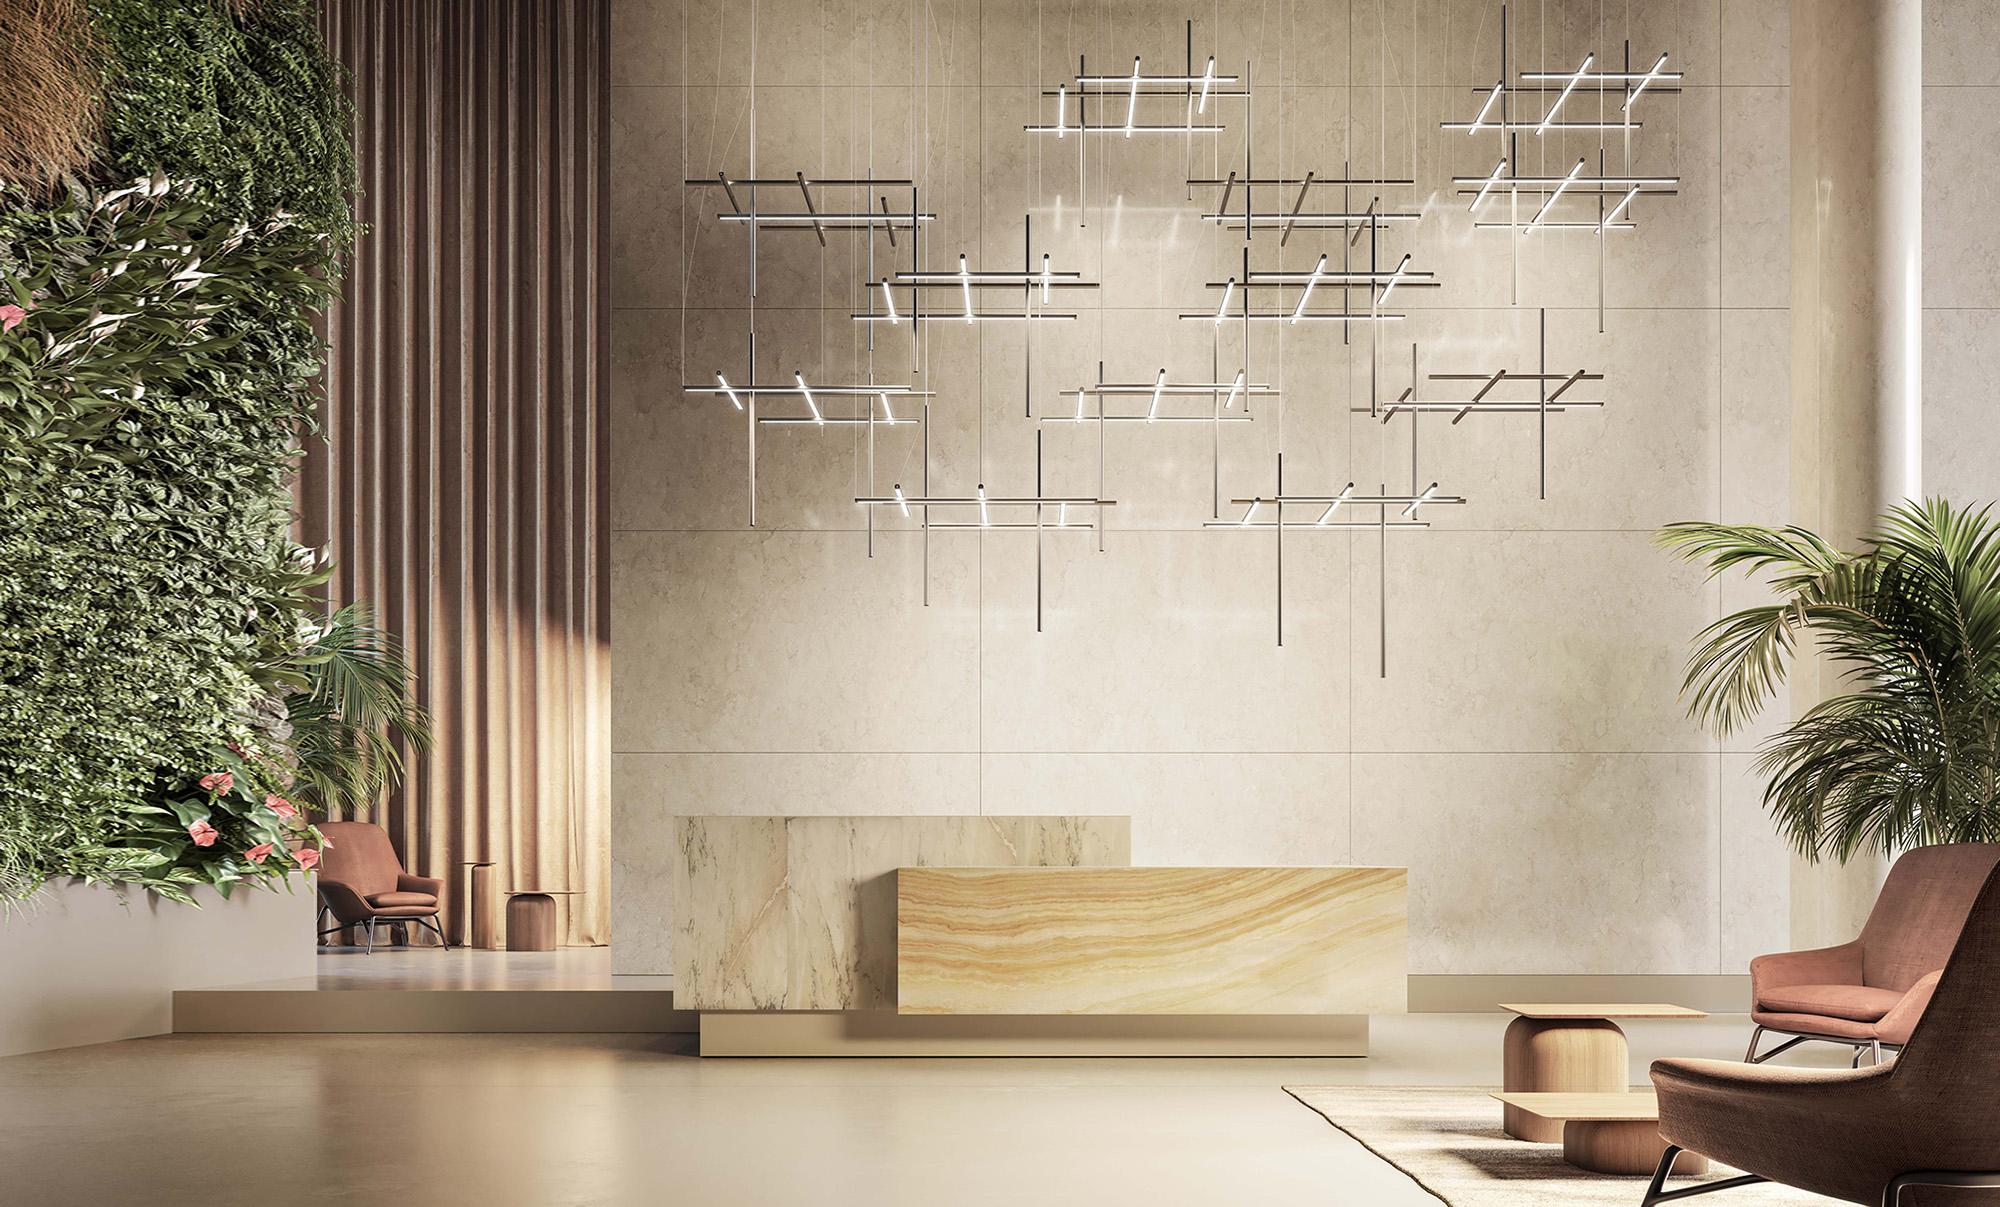 HILOW | design: Matteo Thun